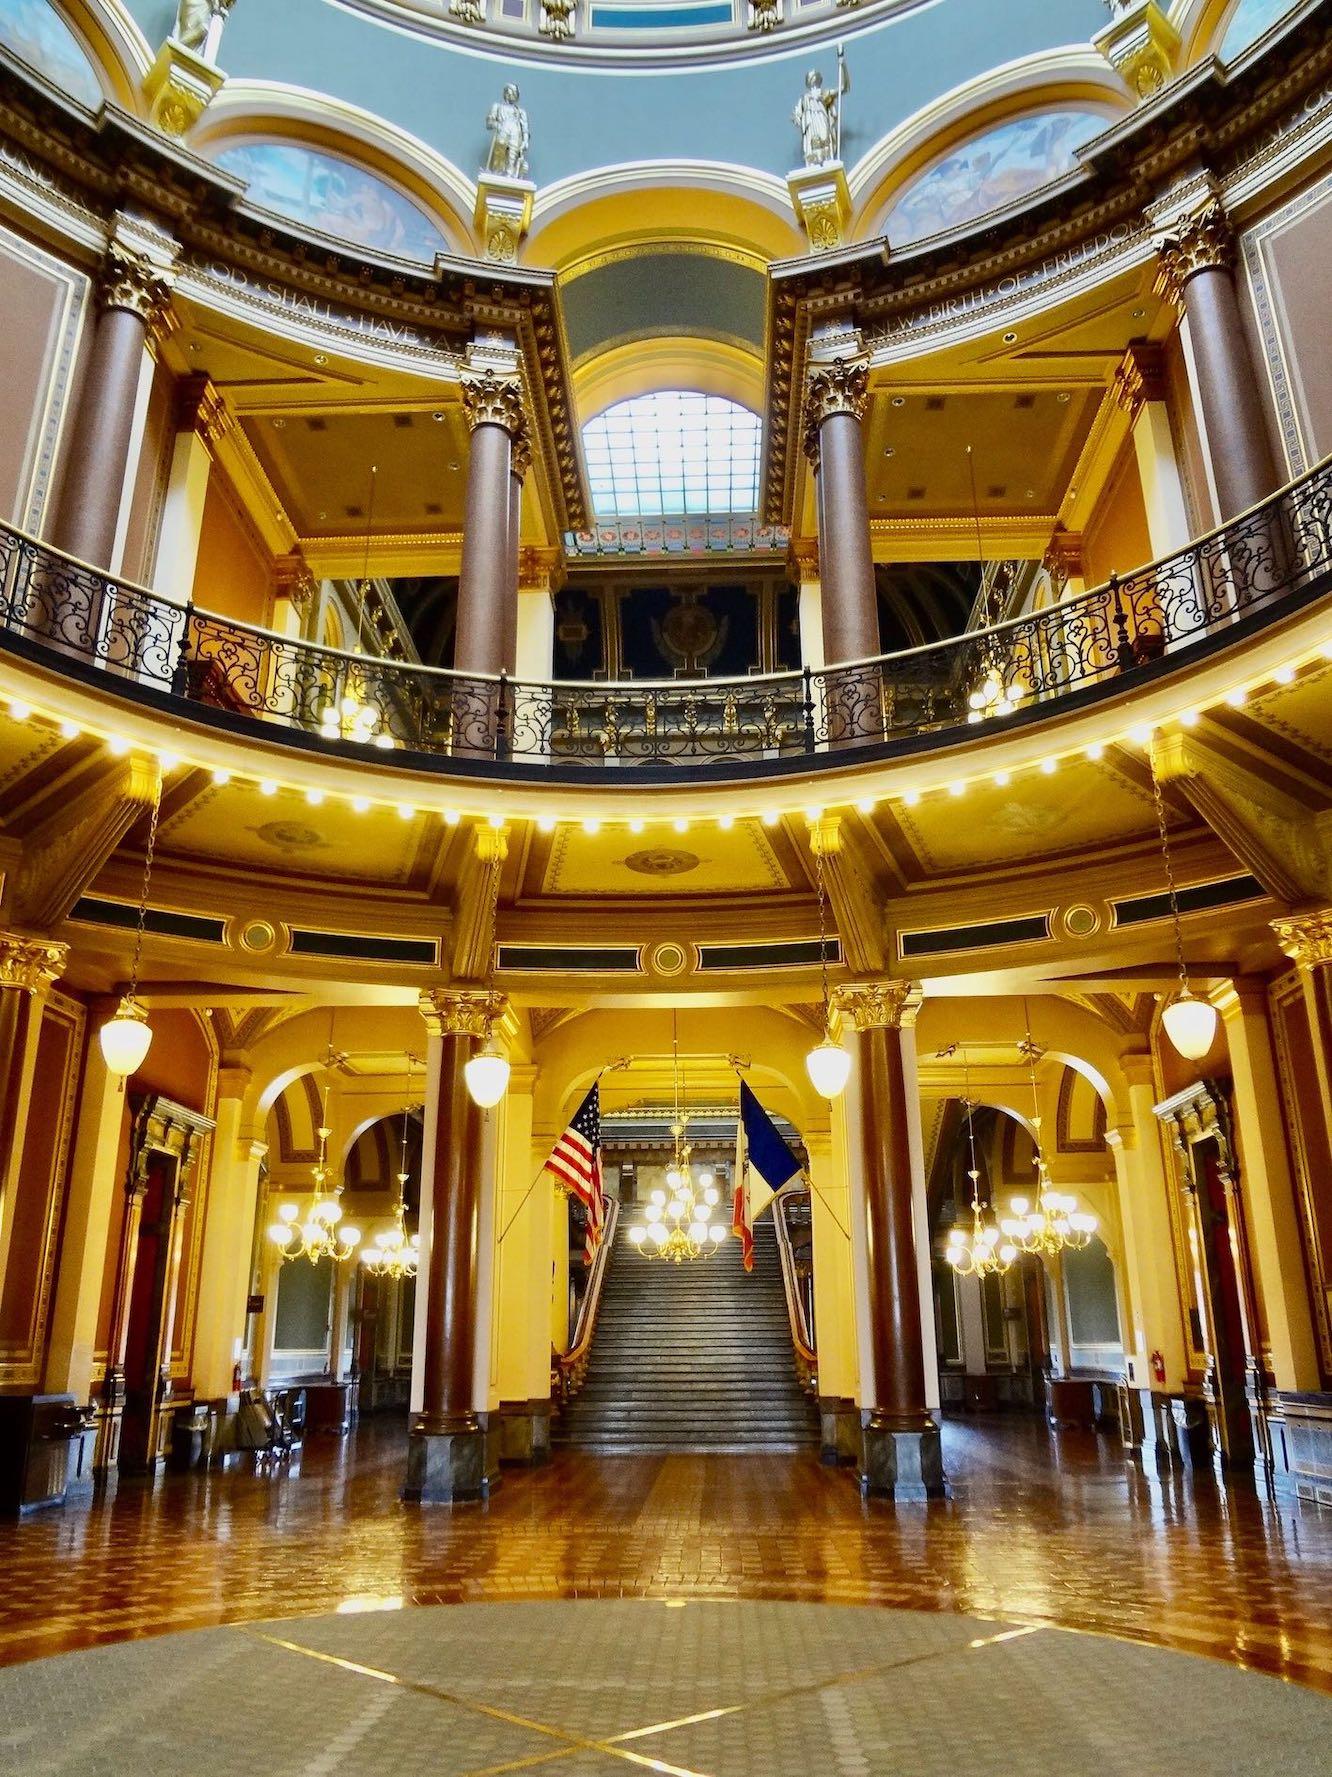 Inside the Iowa State Capital.